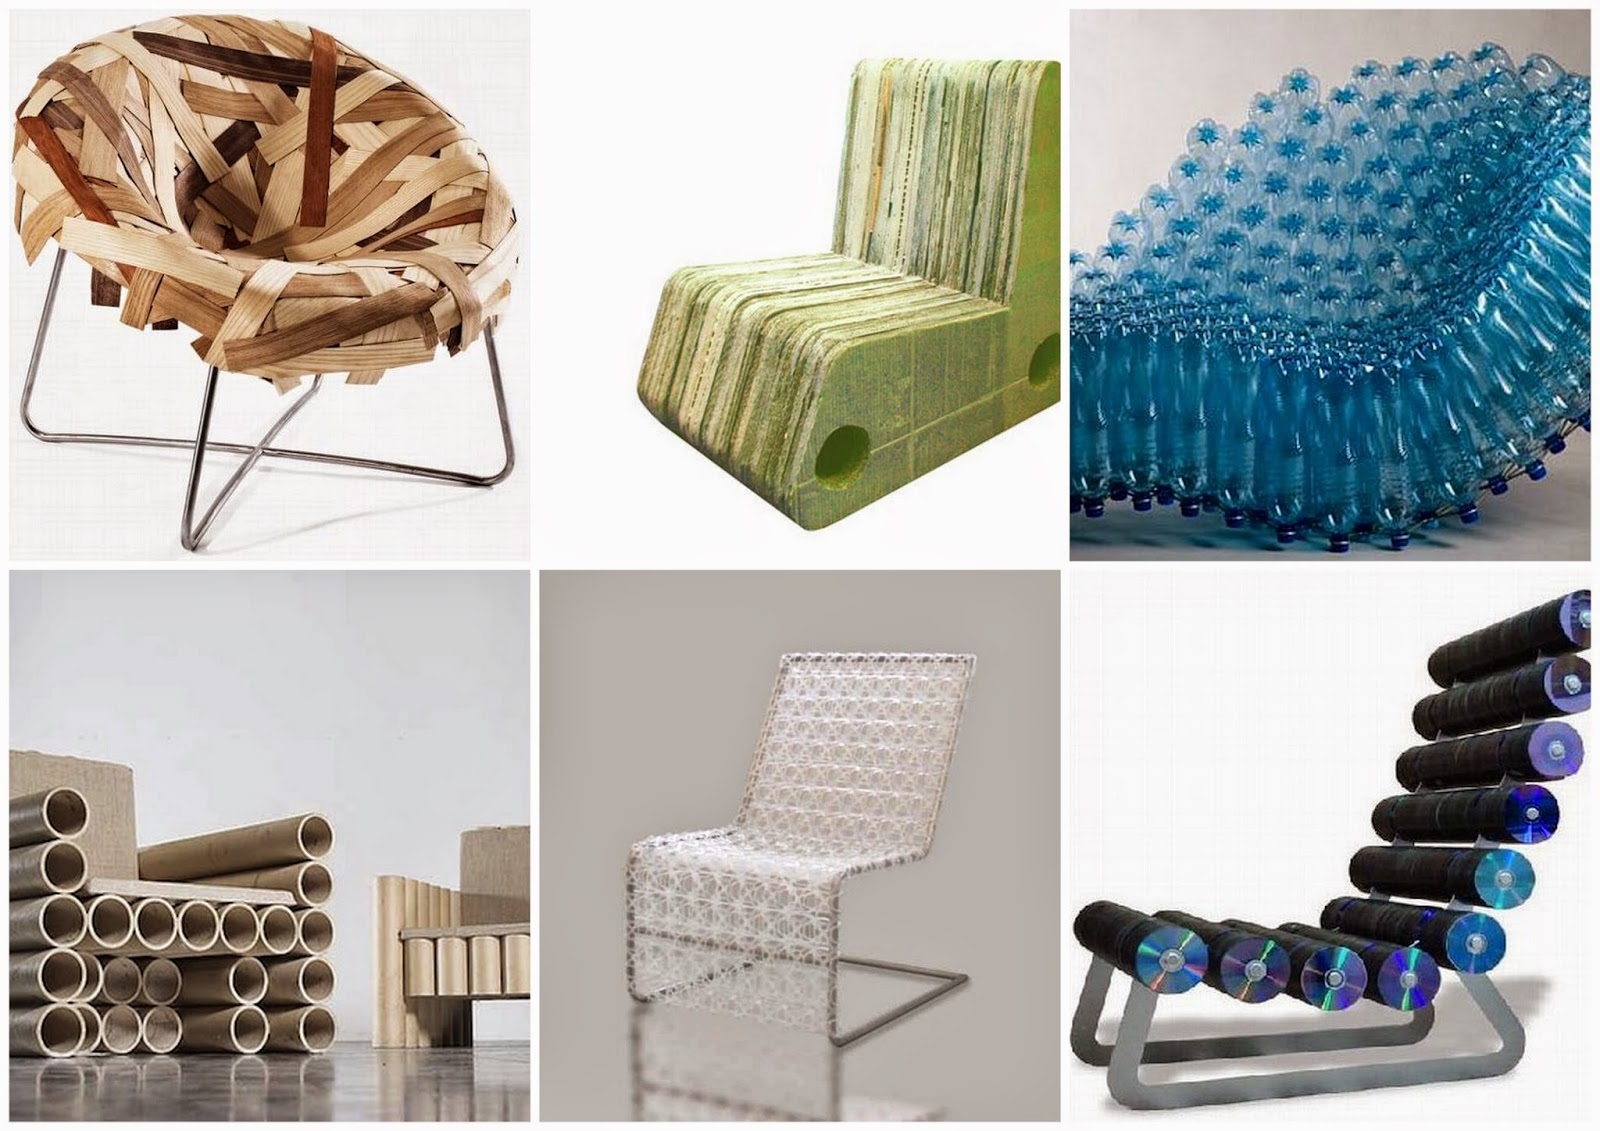 Aldea Zur Proyecto Dise O De Mobiliario Con Material De